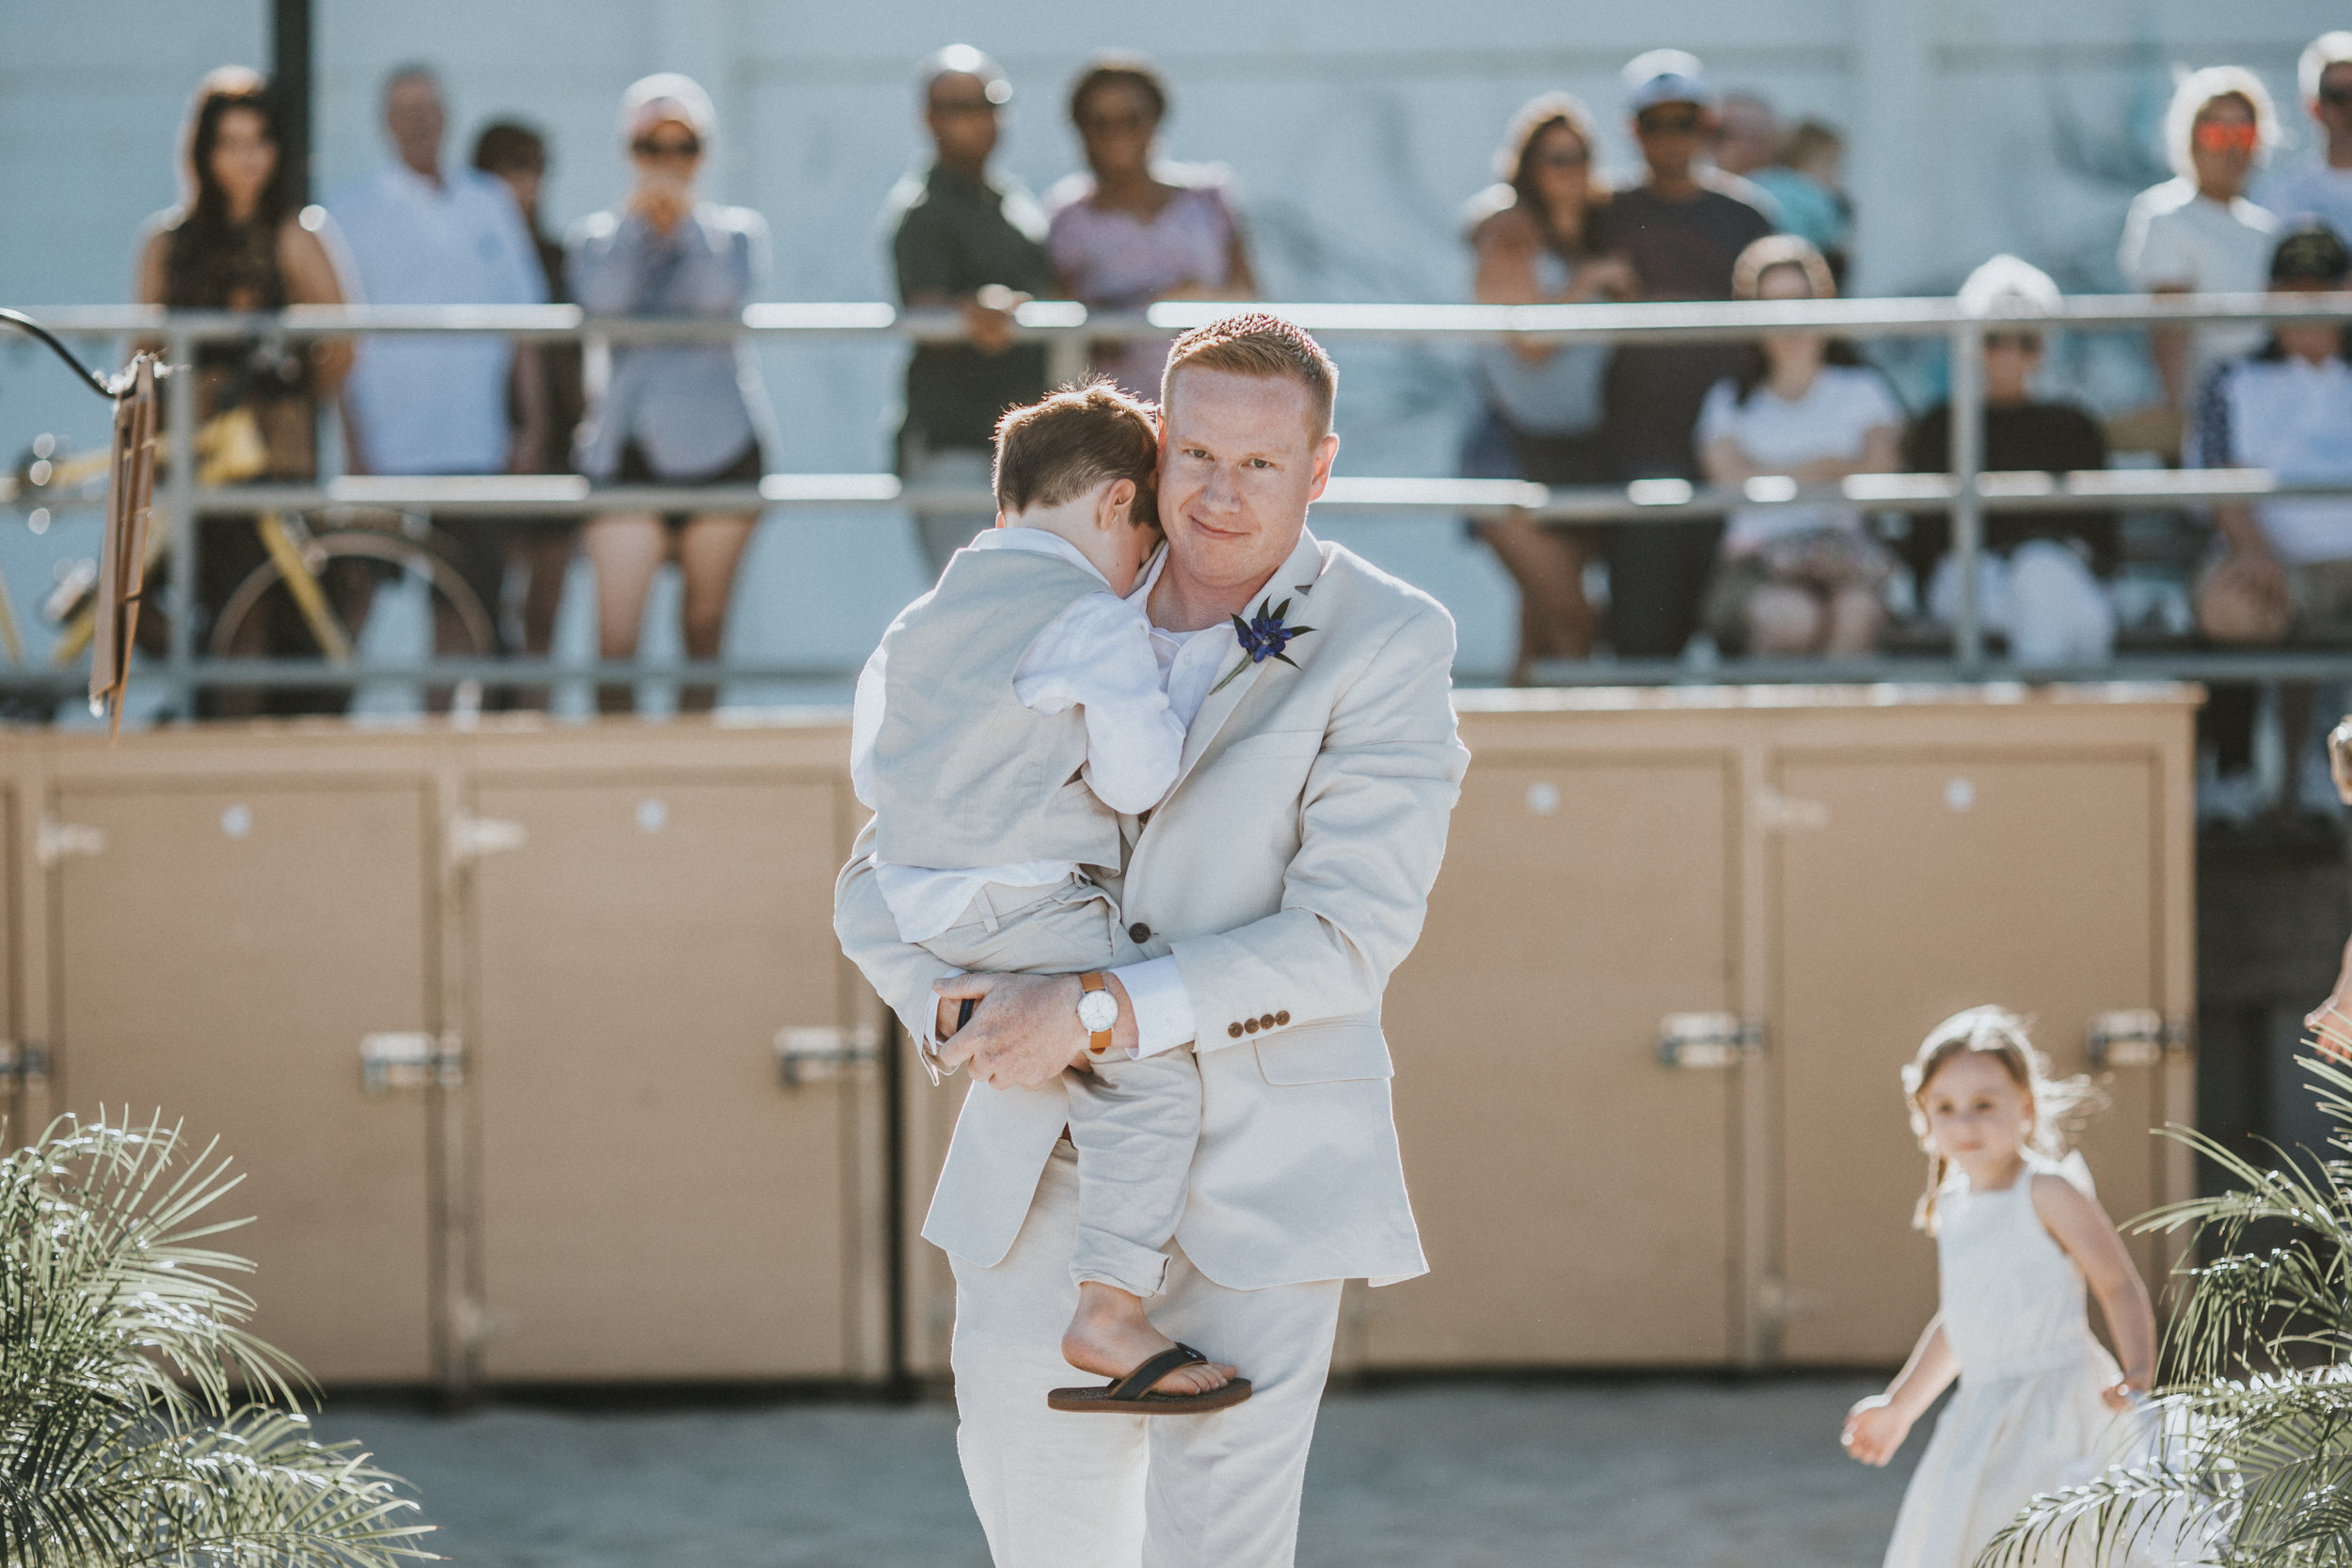 JennaLynnPhotography-NJWeddingPhotographer-Wedding-TheBerkeley-AsburyPark-Allison&Michael-Ceremony-15.jpg